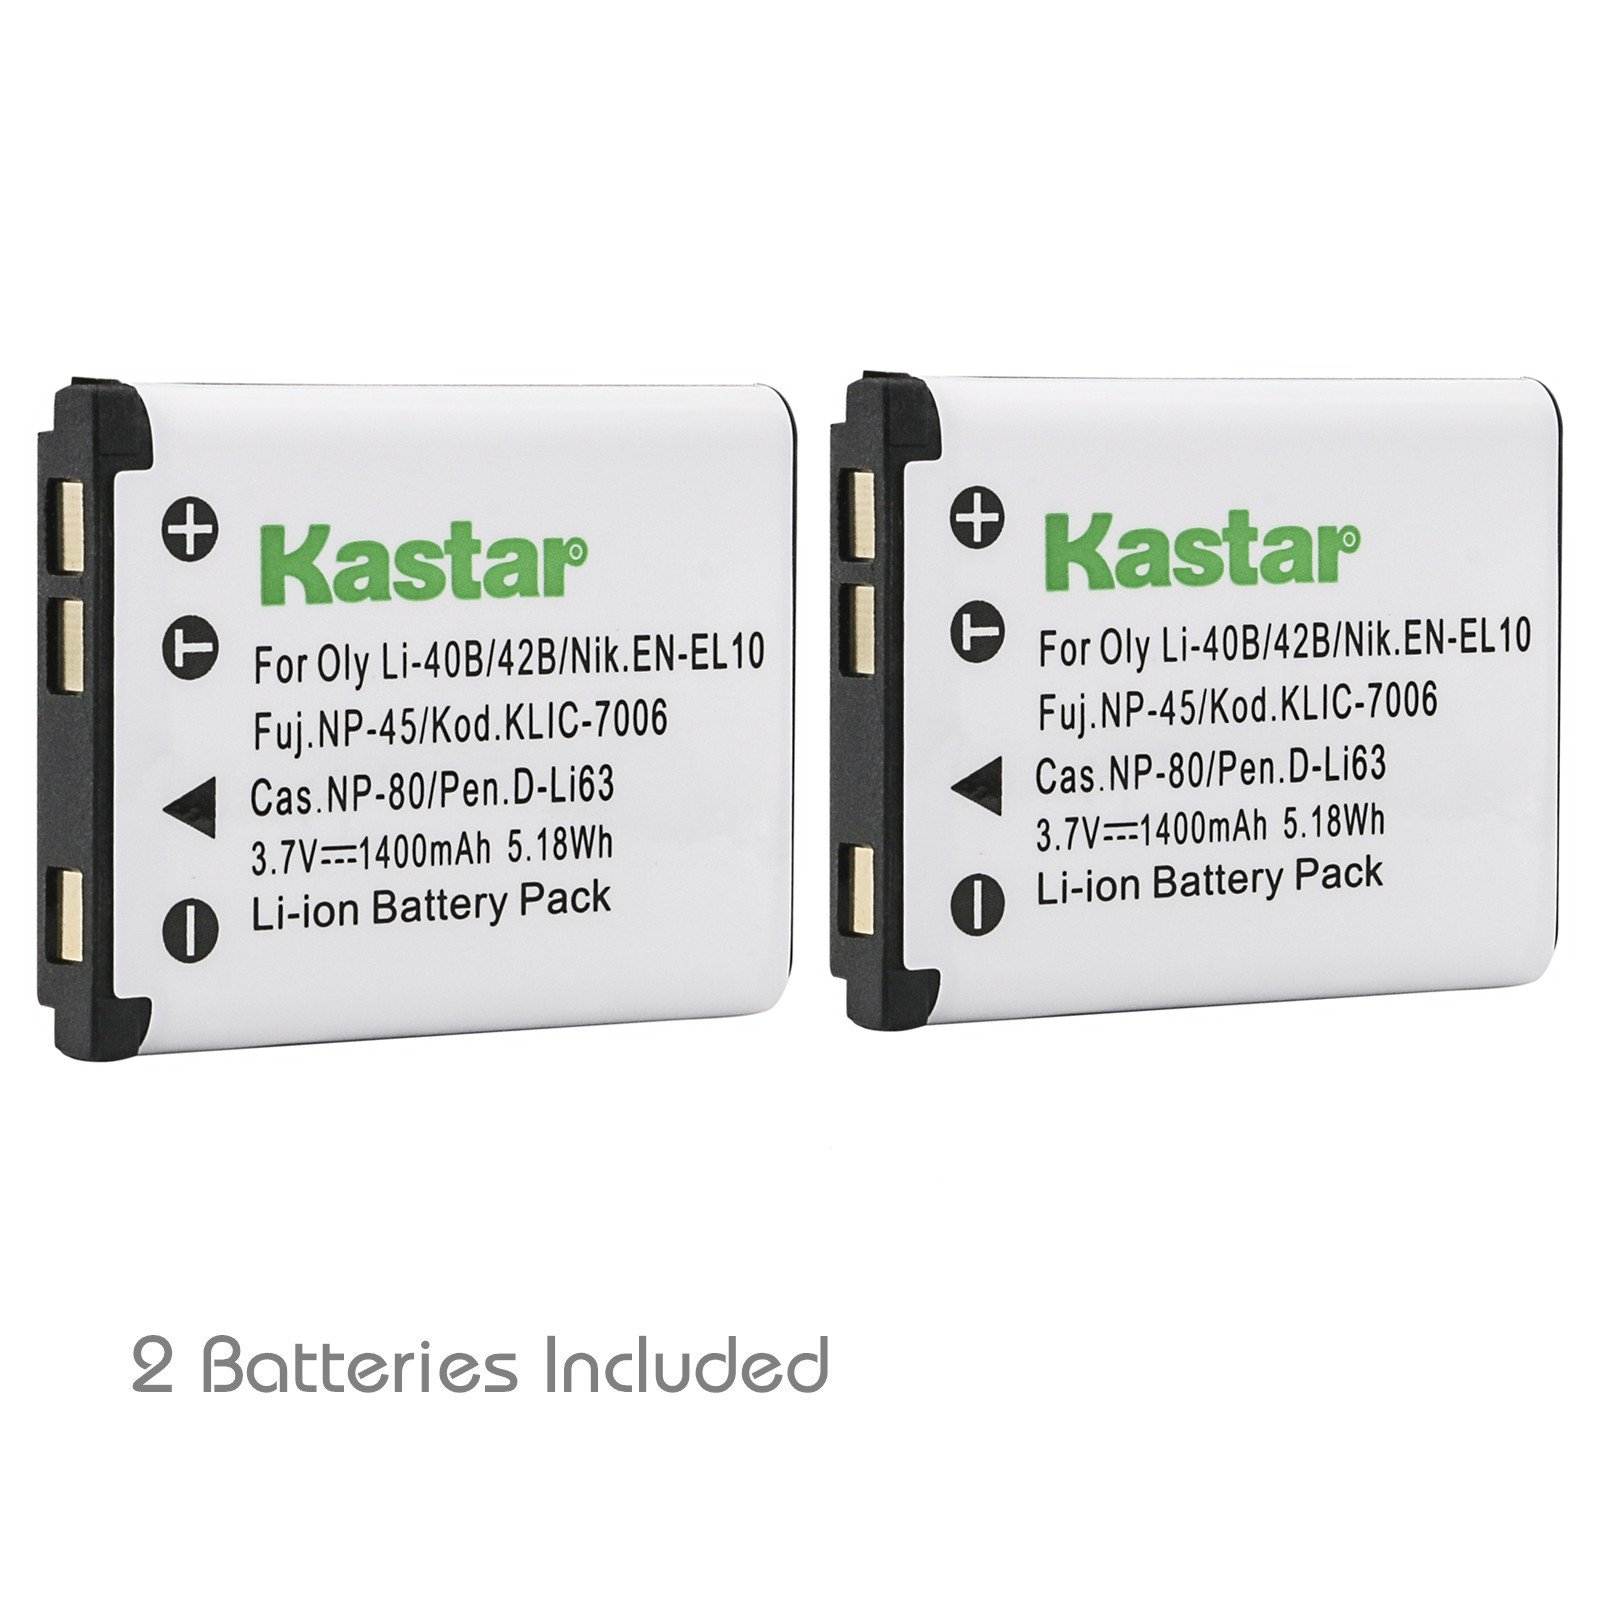 Kastar Battery (2-Pack) for Nikon EN-EL10 MH-63 work with Nikon Coolpix S60, S80, S200, S210, S220, S230, S500, S510, S520, S570, S600, S700, S3000, S4000, S5100 Cameras